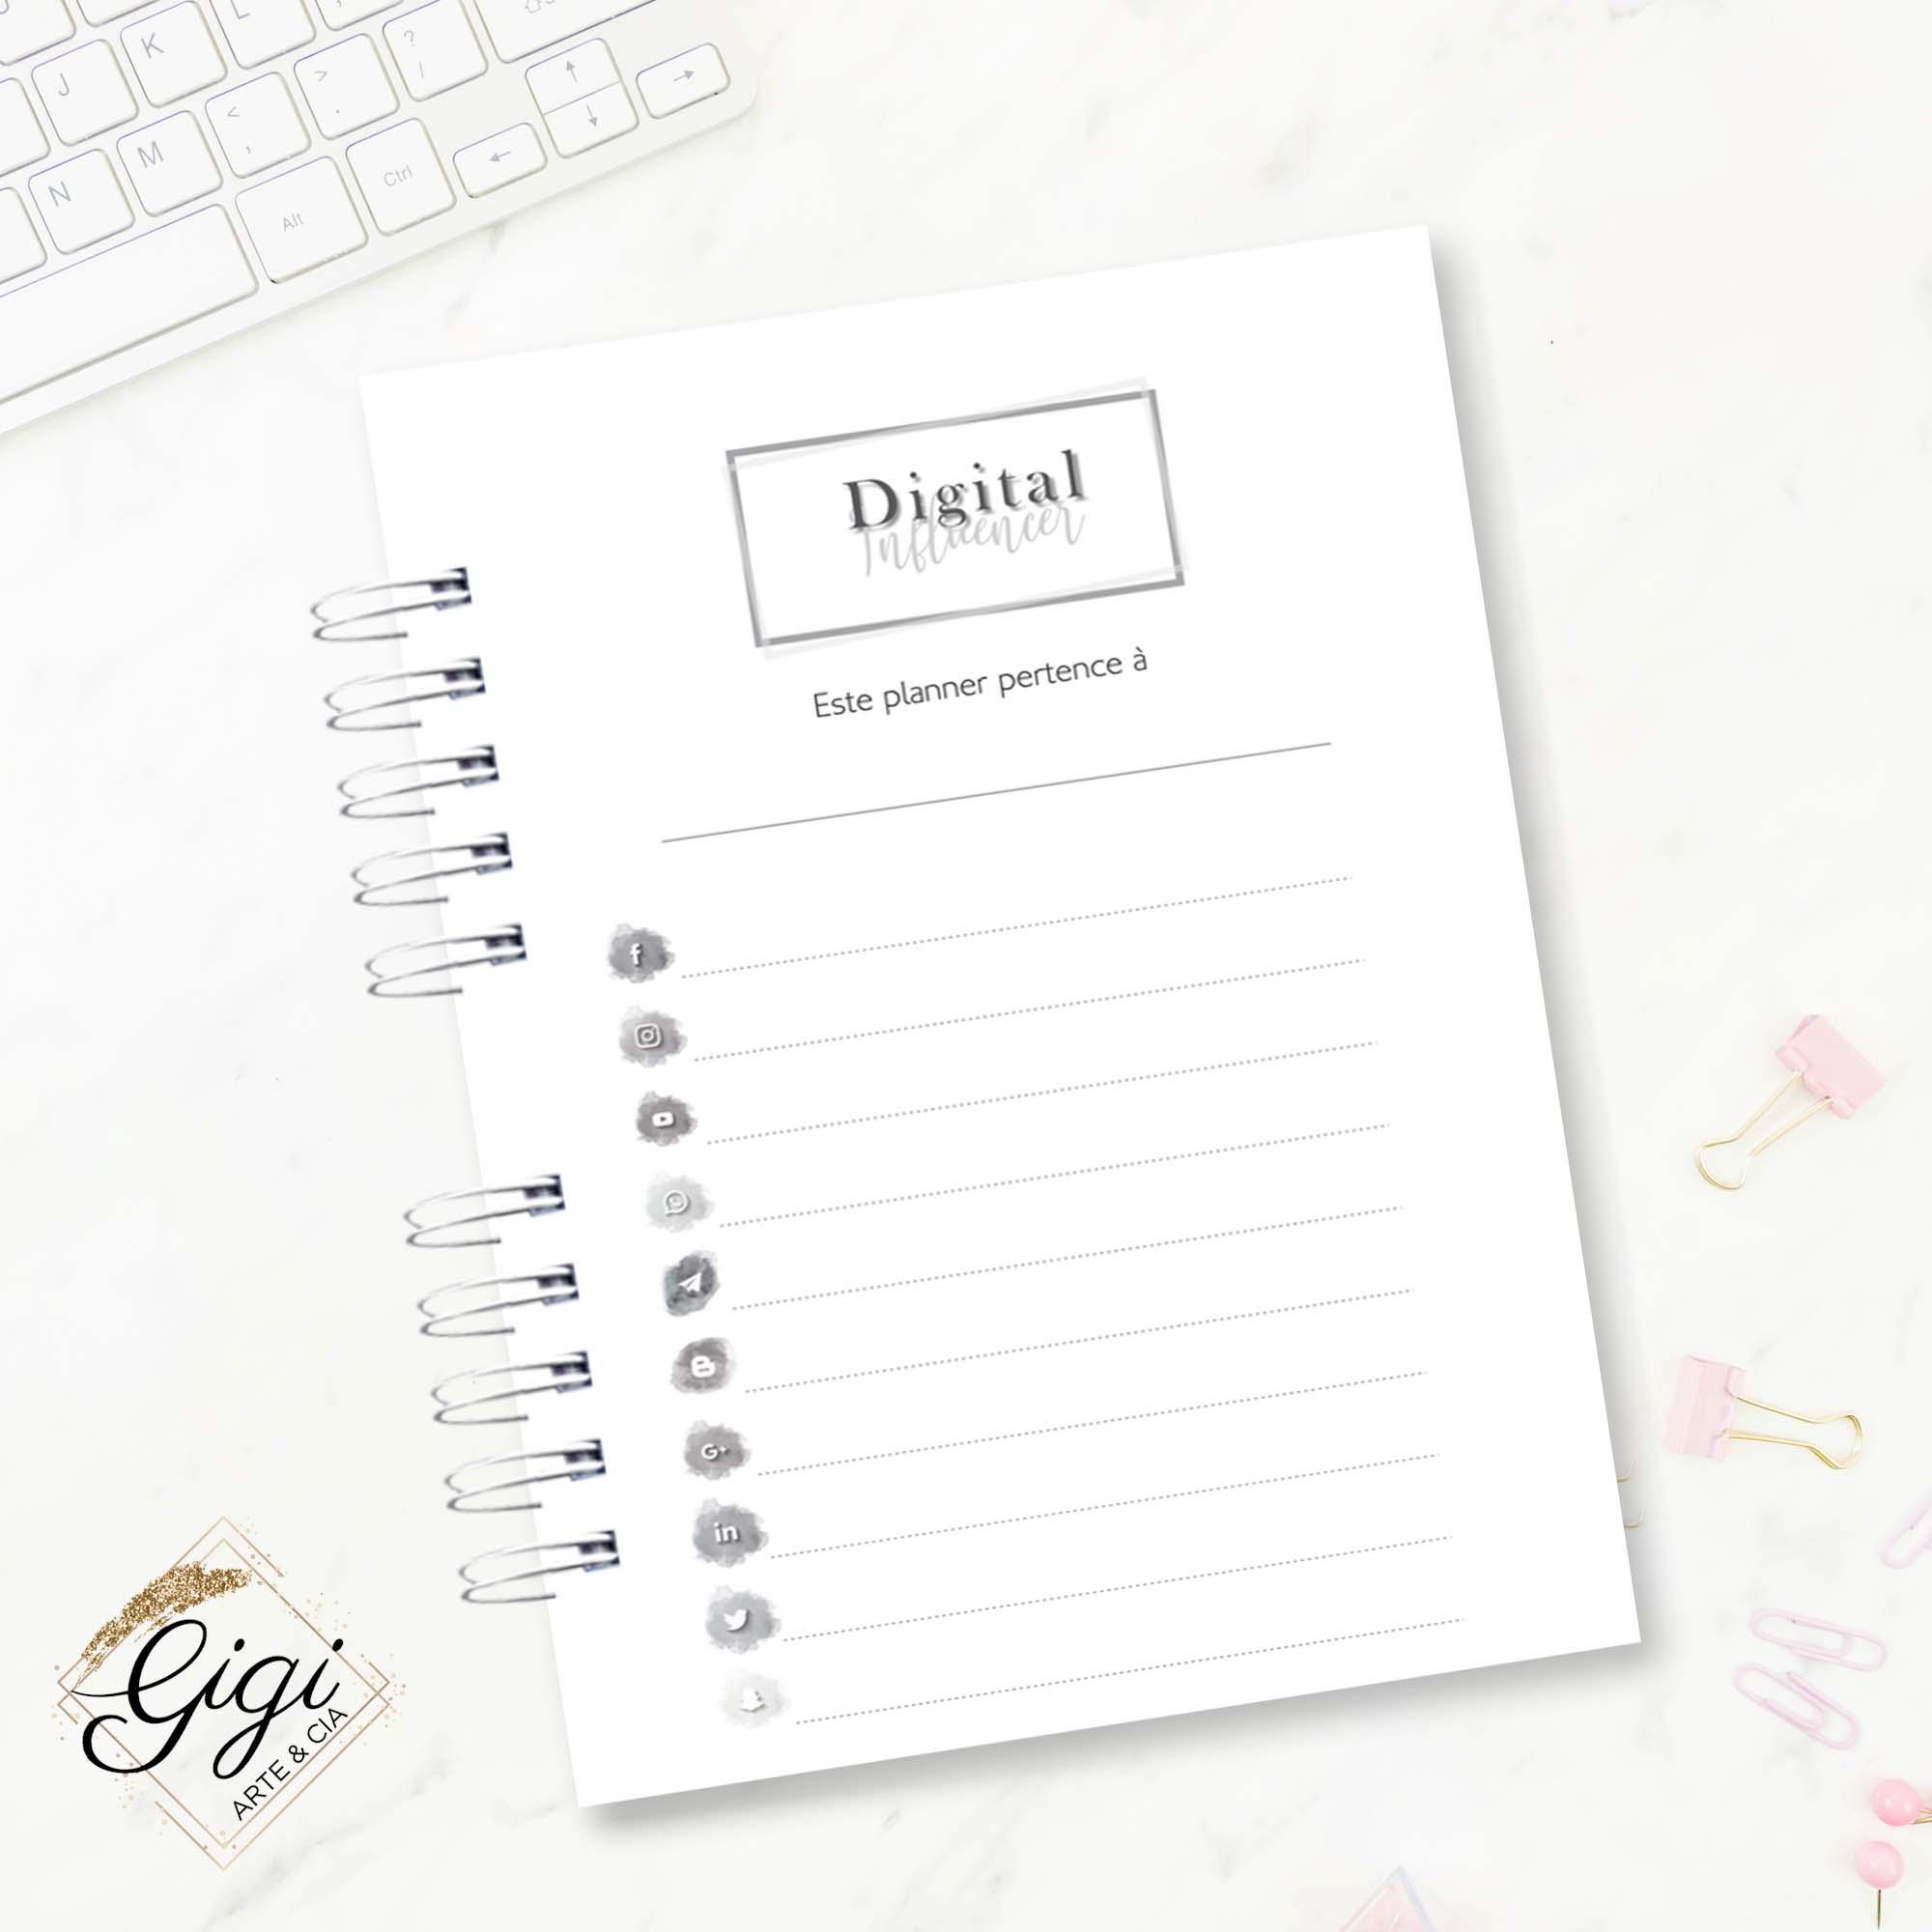 Planner - Digital Influencer/Redes Sociais  - Petit Palais de Papier